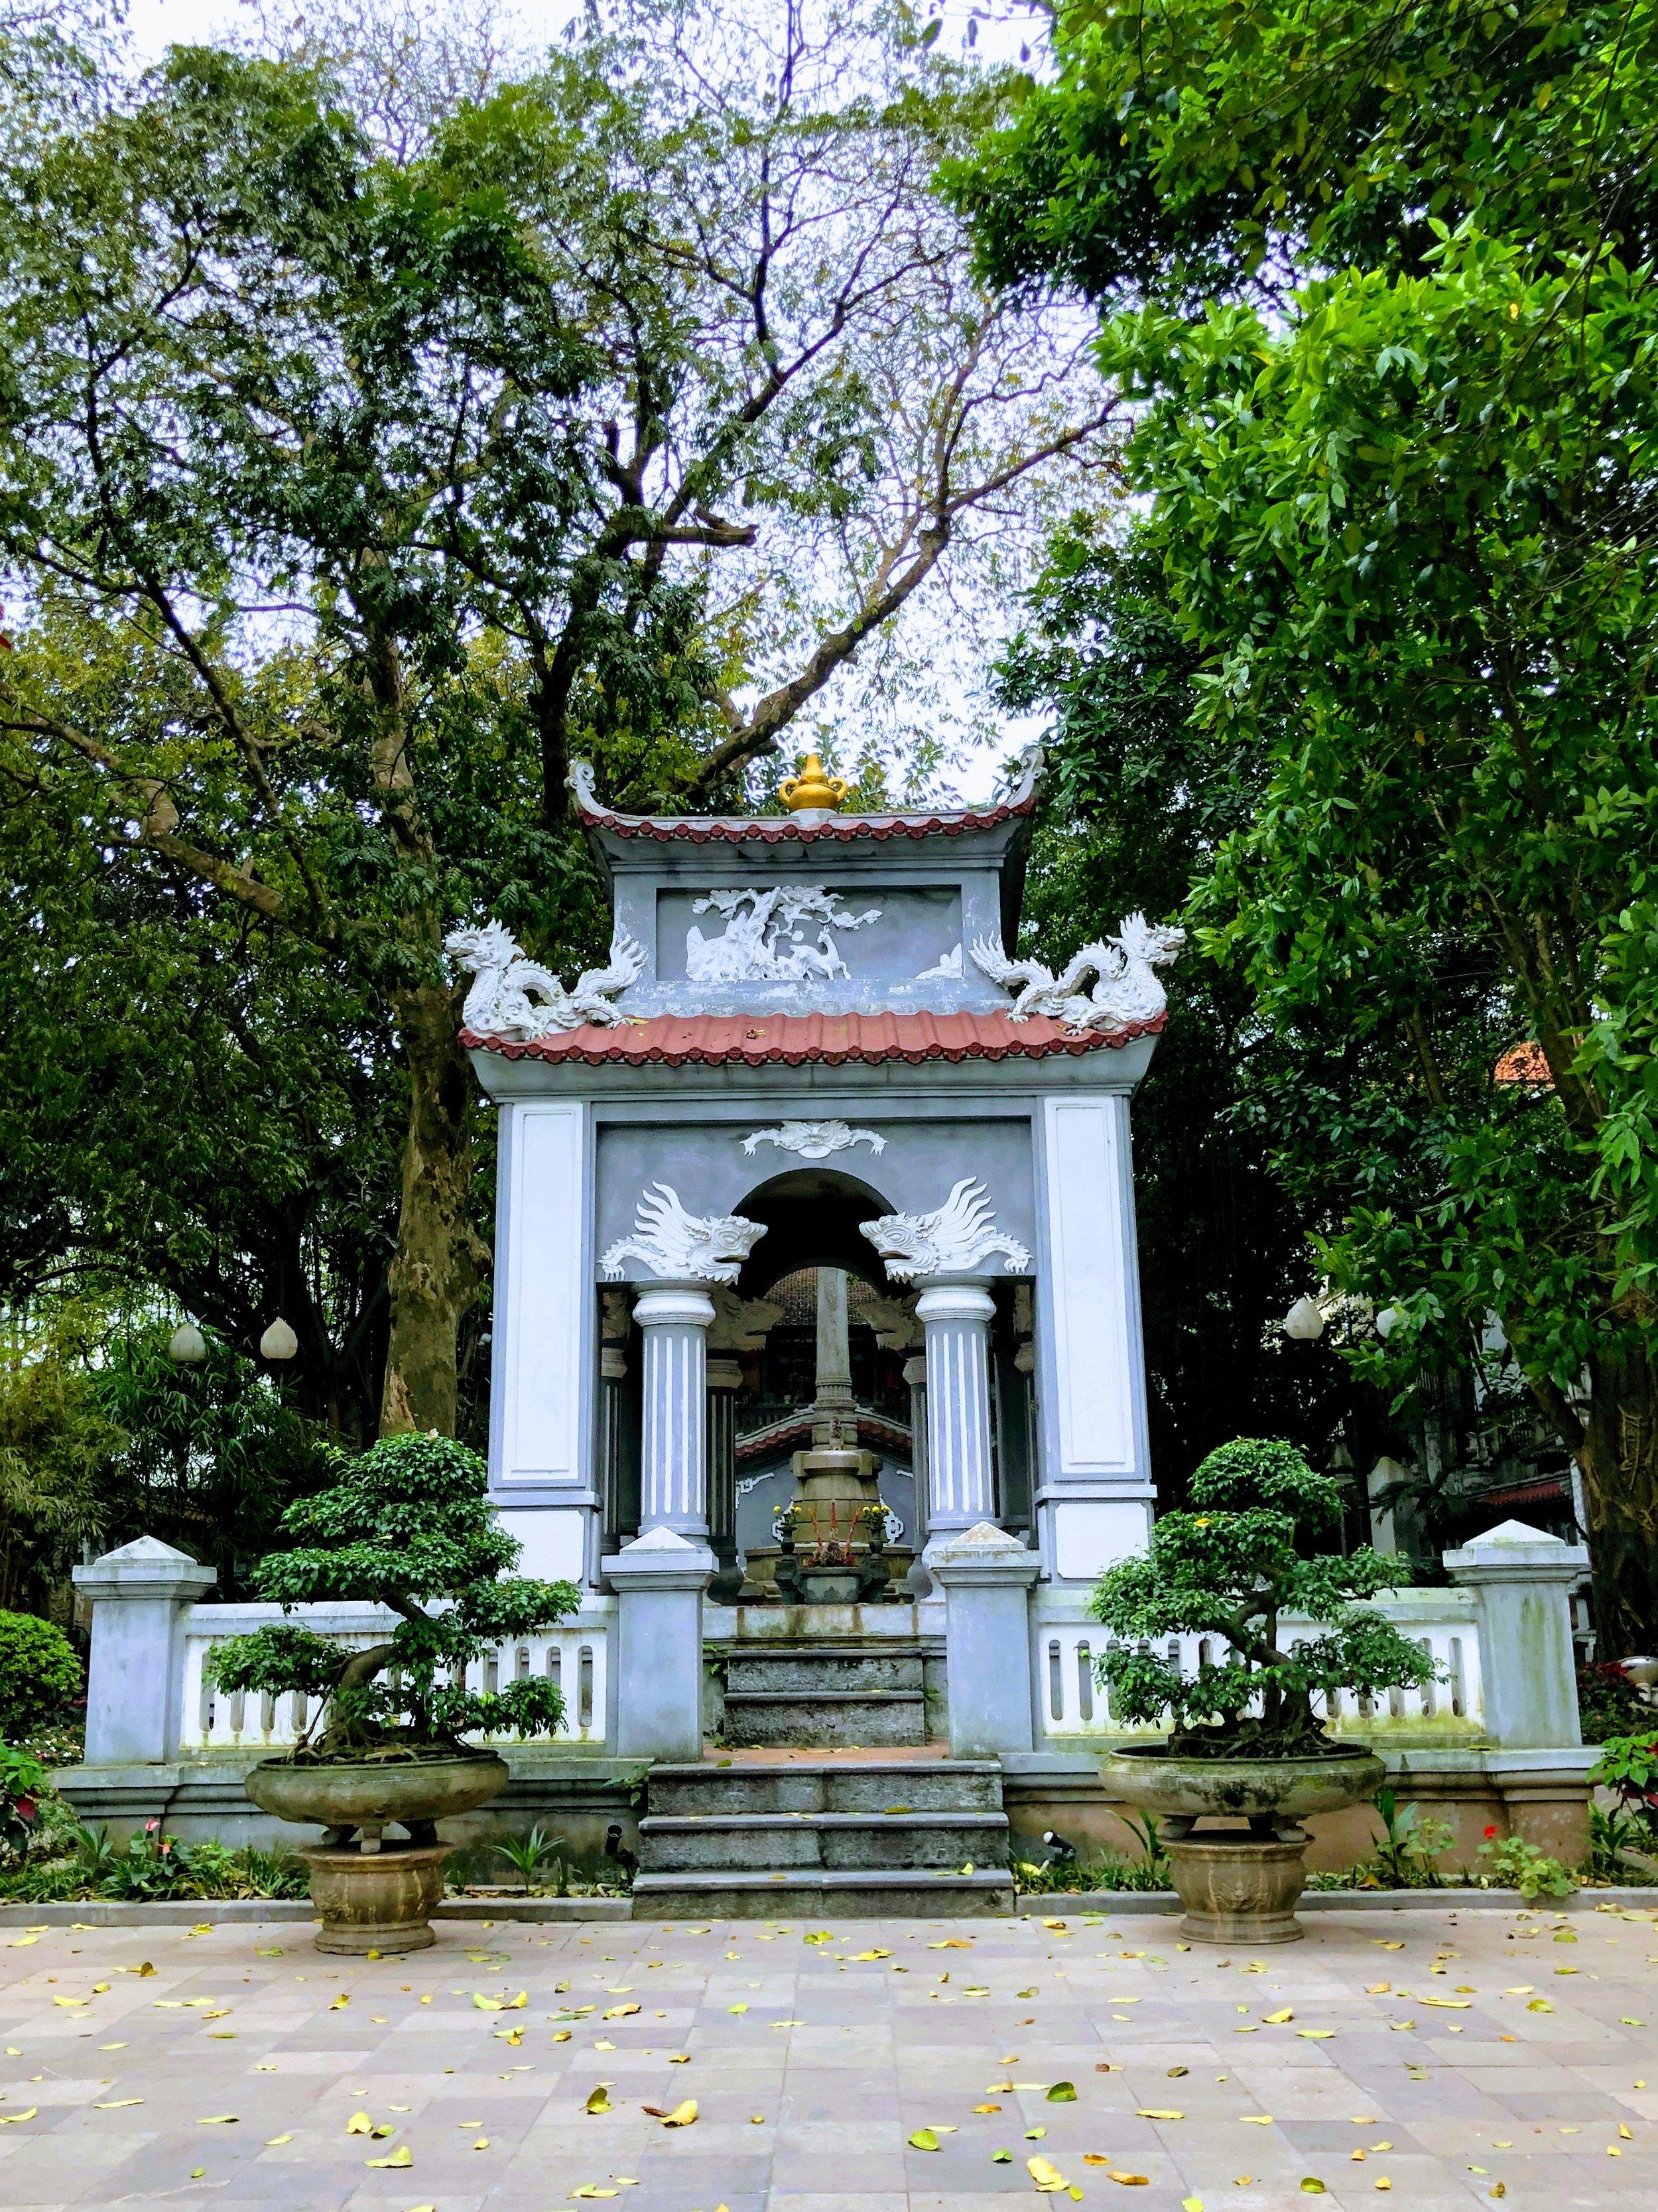 A little shrine by Hoan Kiem Lake. (No English signs, unfortunately.)